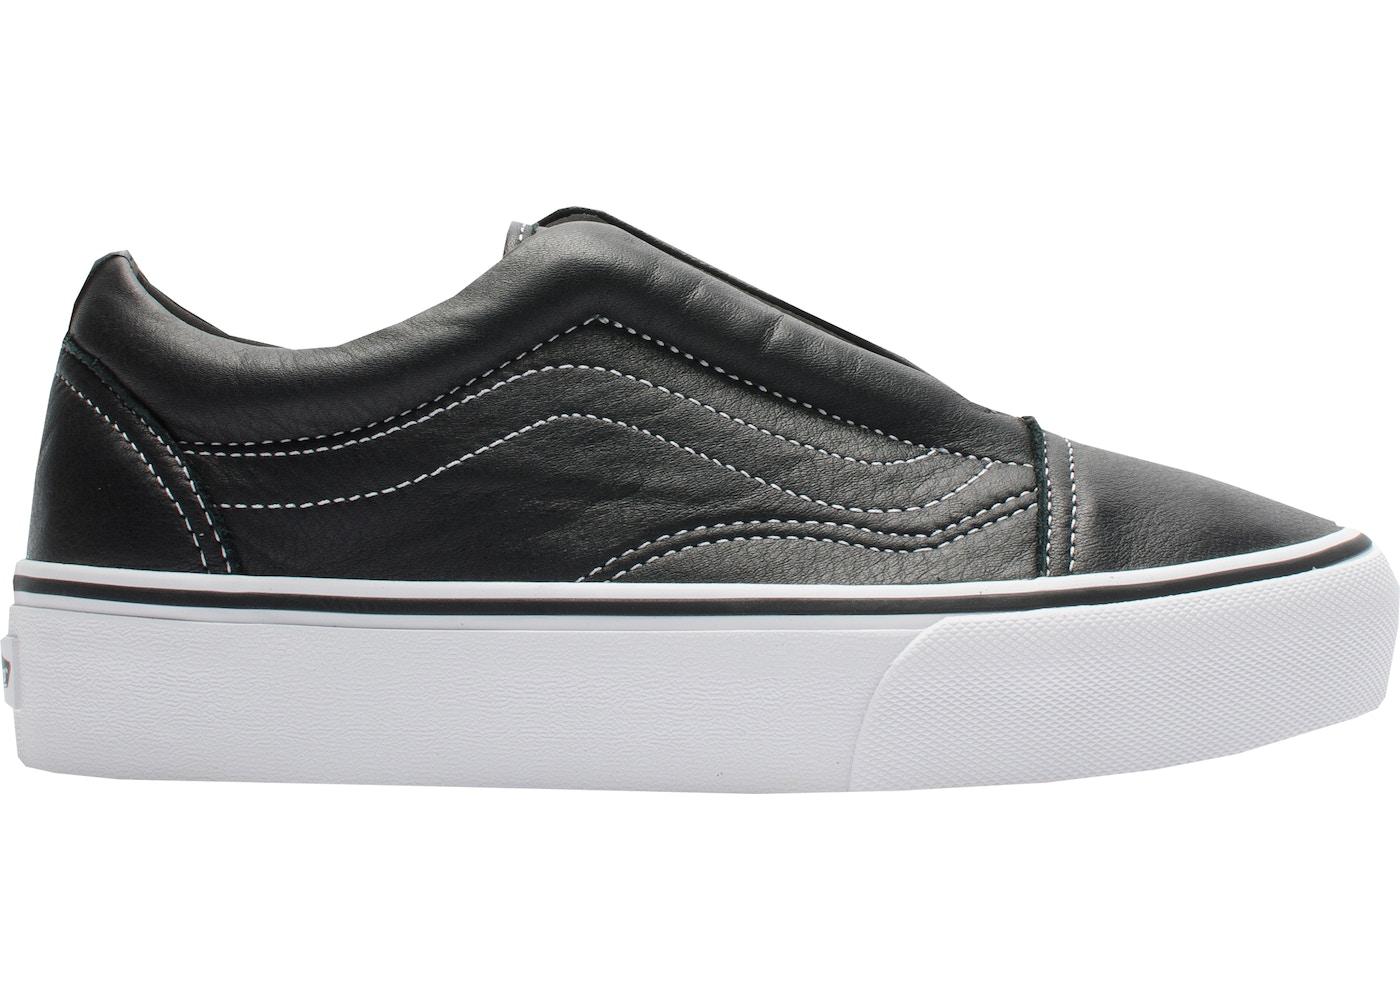 049af47551 Vans Classic Slip-On Karl Lagerfeld Black (W) - VA3DPXOEJ